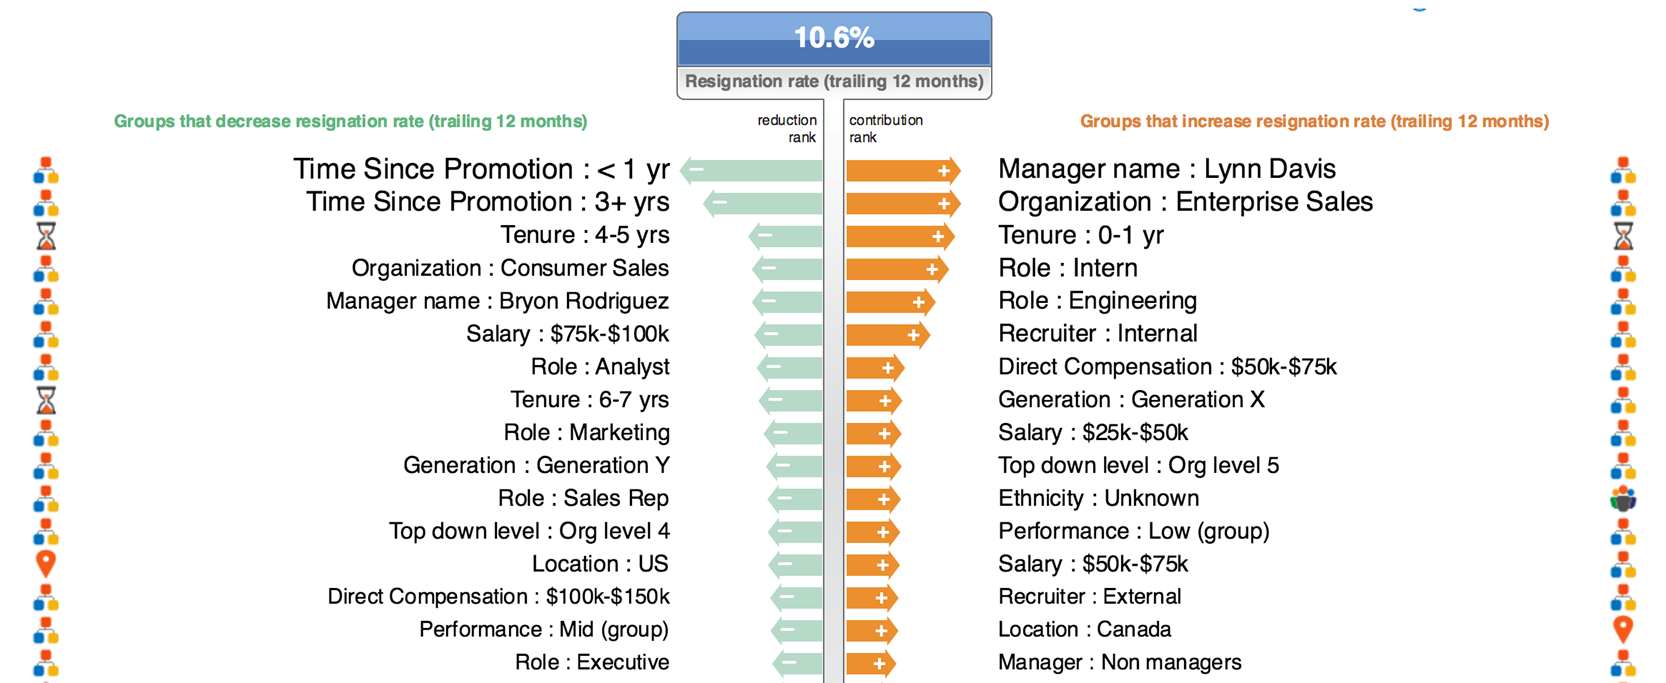 questions to assess management effectiveness inc hr transformation 2